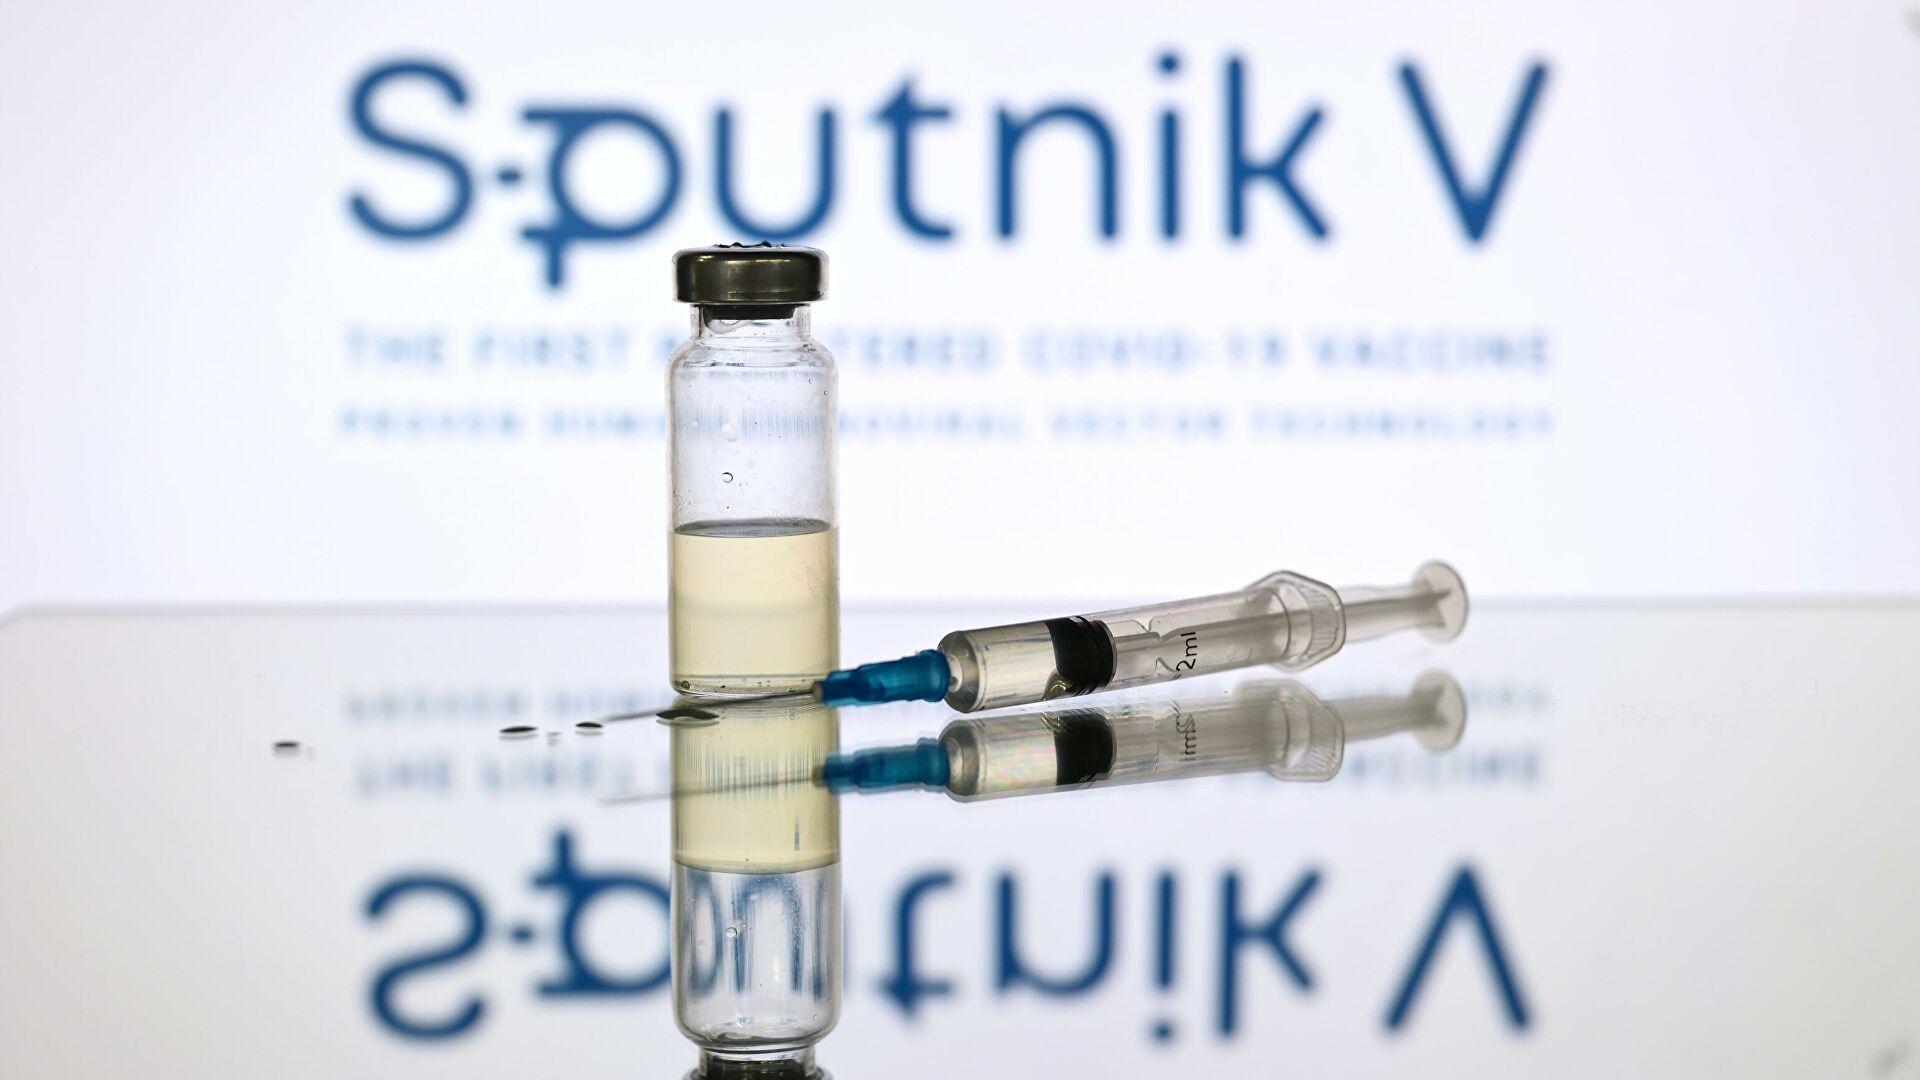 Guatemala anuncia que comprará 16 millones de dosis de la vacuna rusa Sputnik V